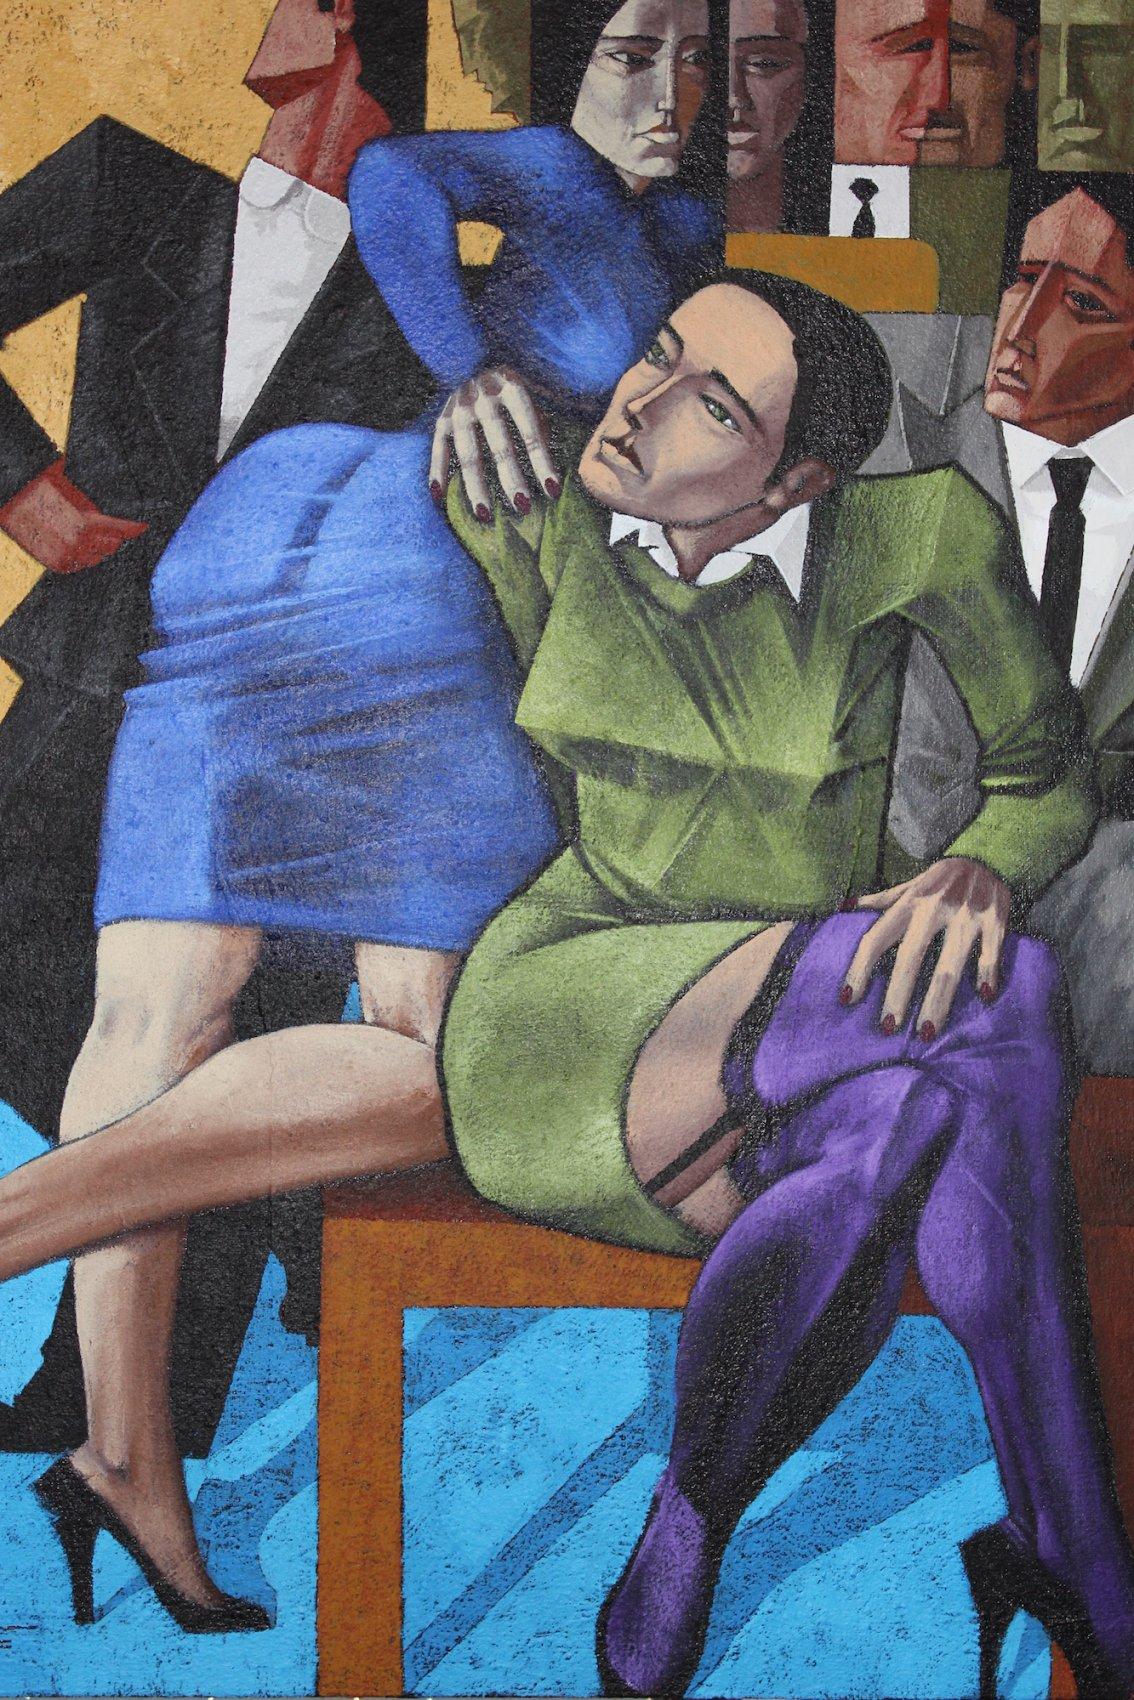 05-DOBLES PAREJAS (2014) - Alfredo Montaña